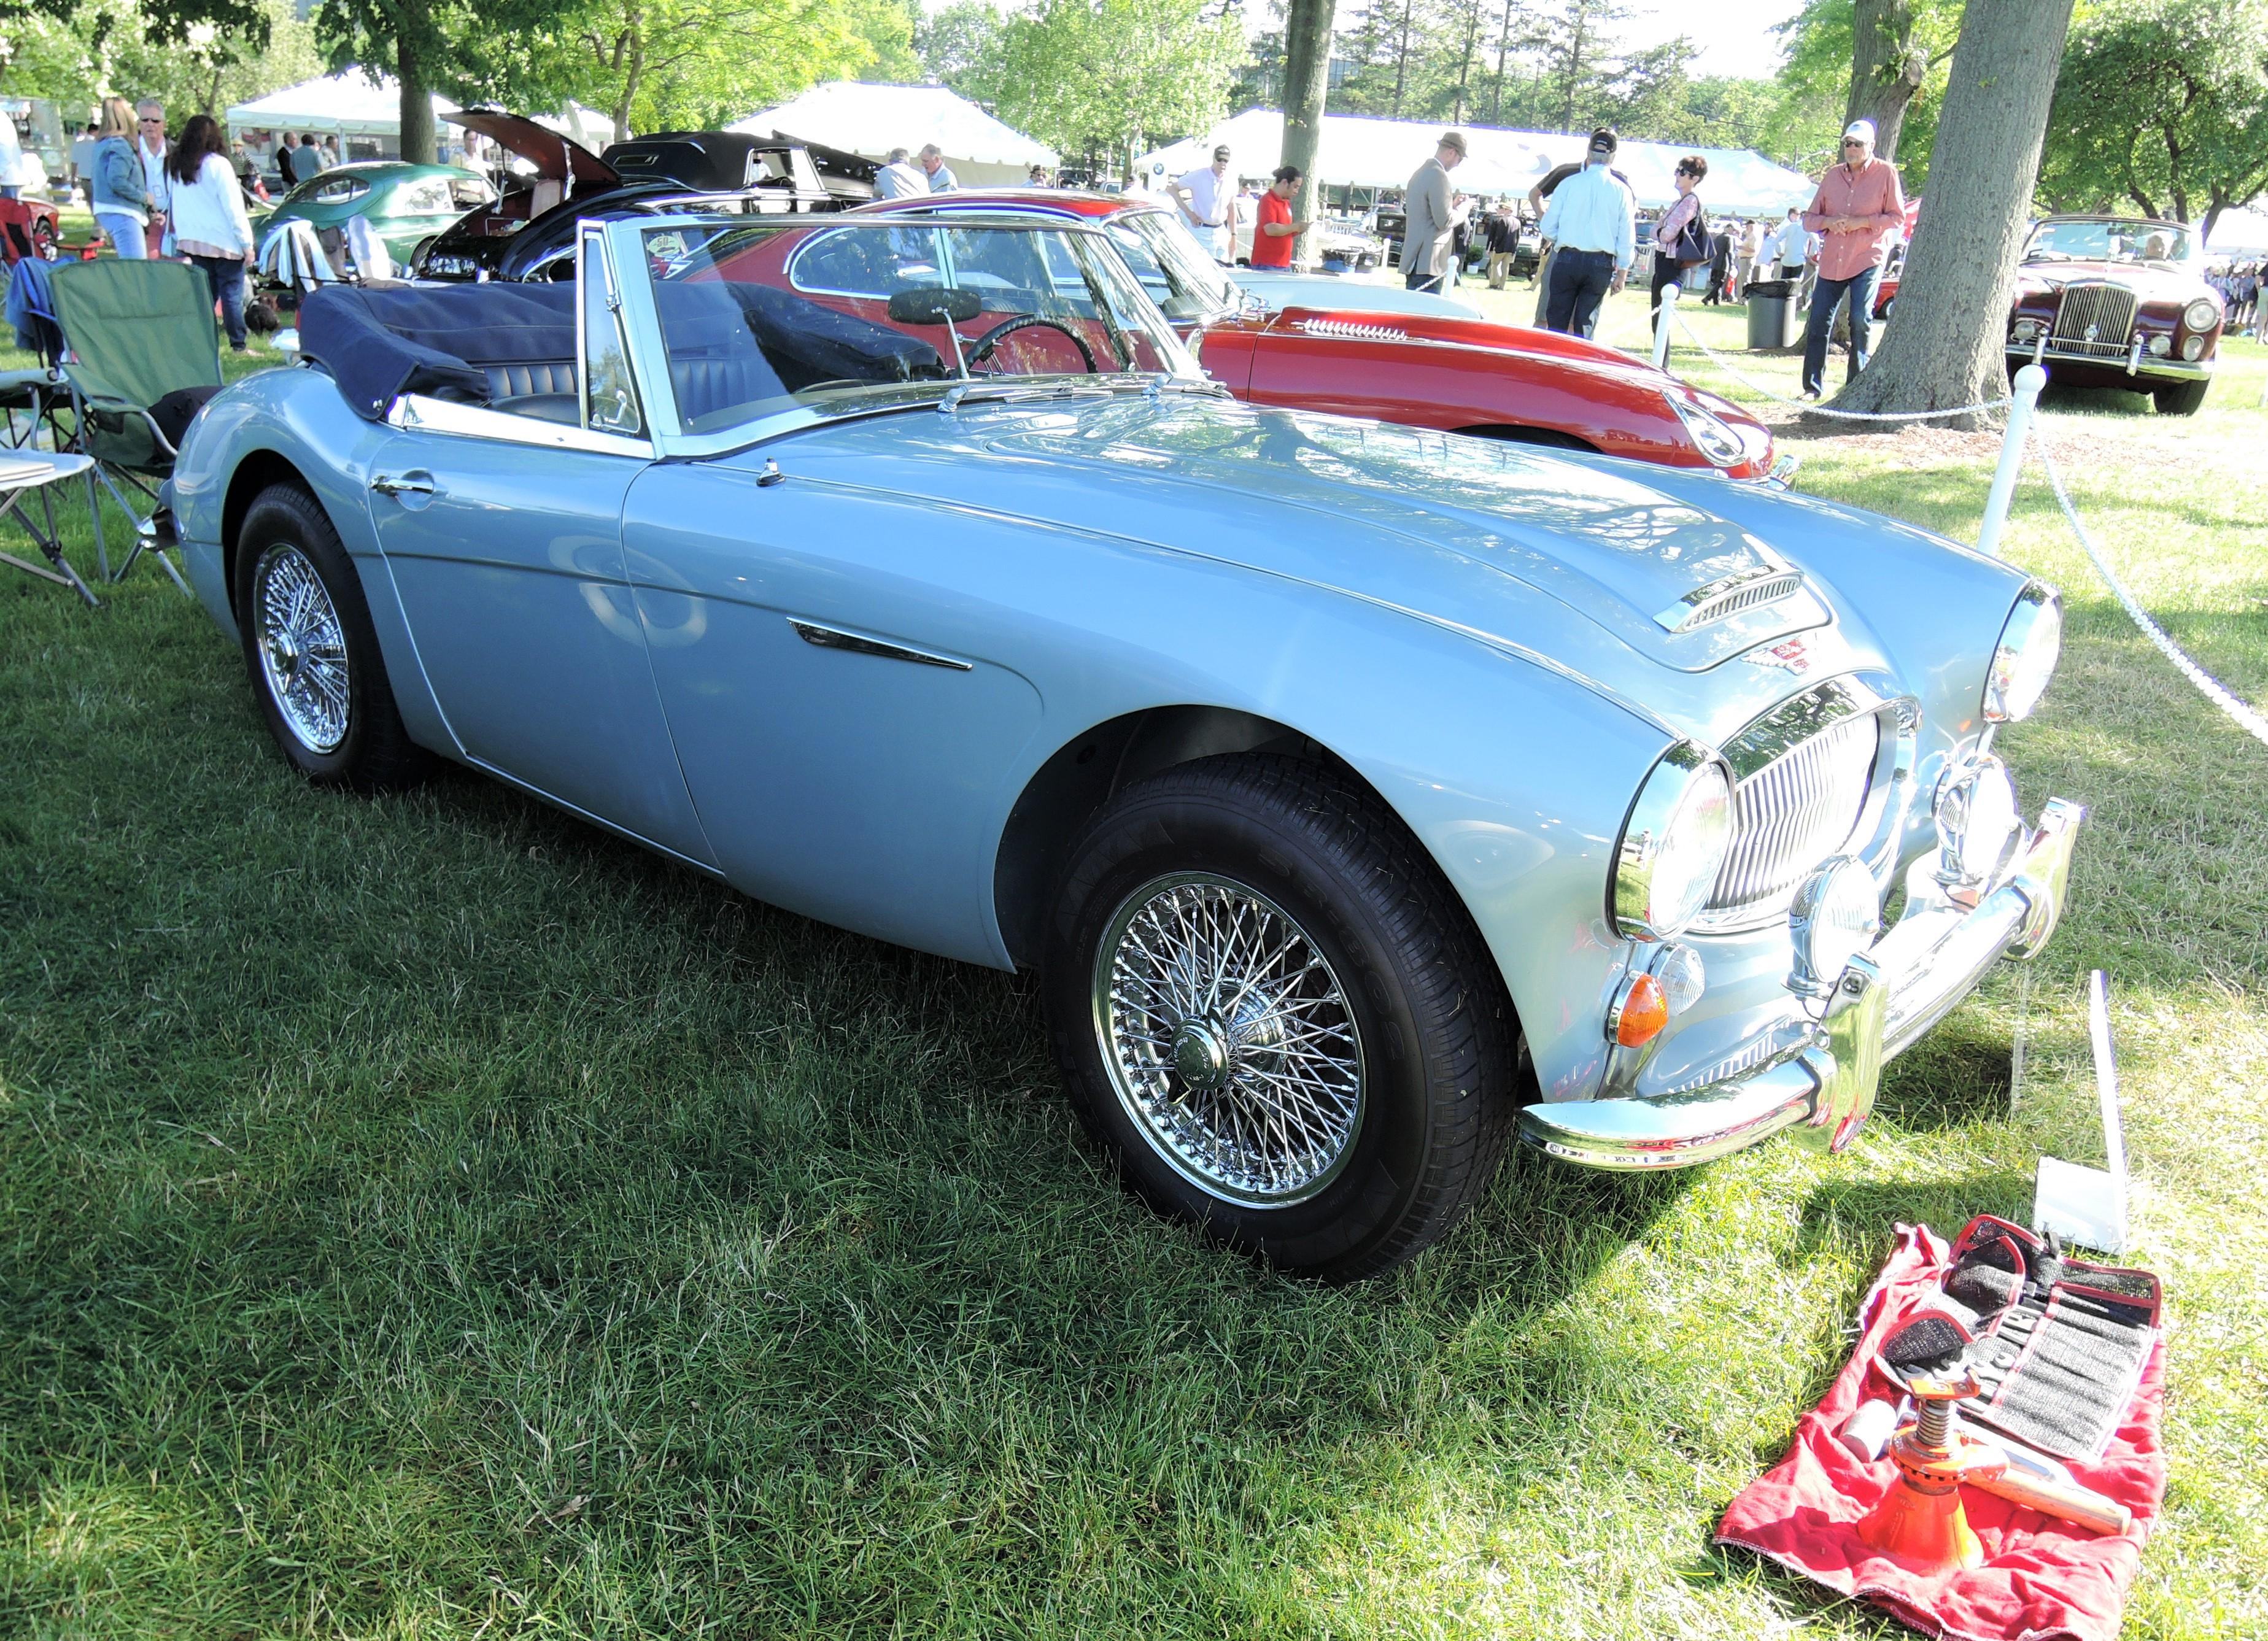 blue 1966 Austin-Healey 3000 Mk III (BJ8) - Greenwich Concours d'Elegance 2017